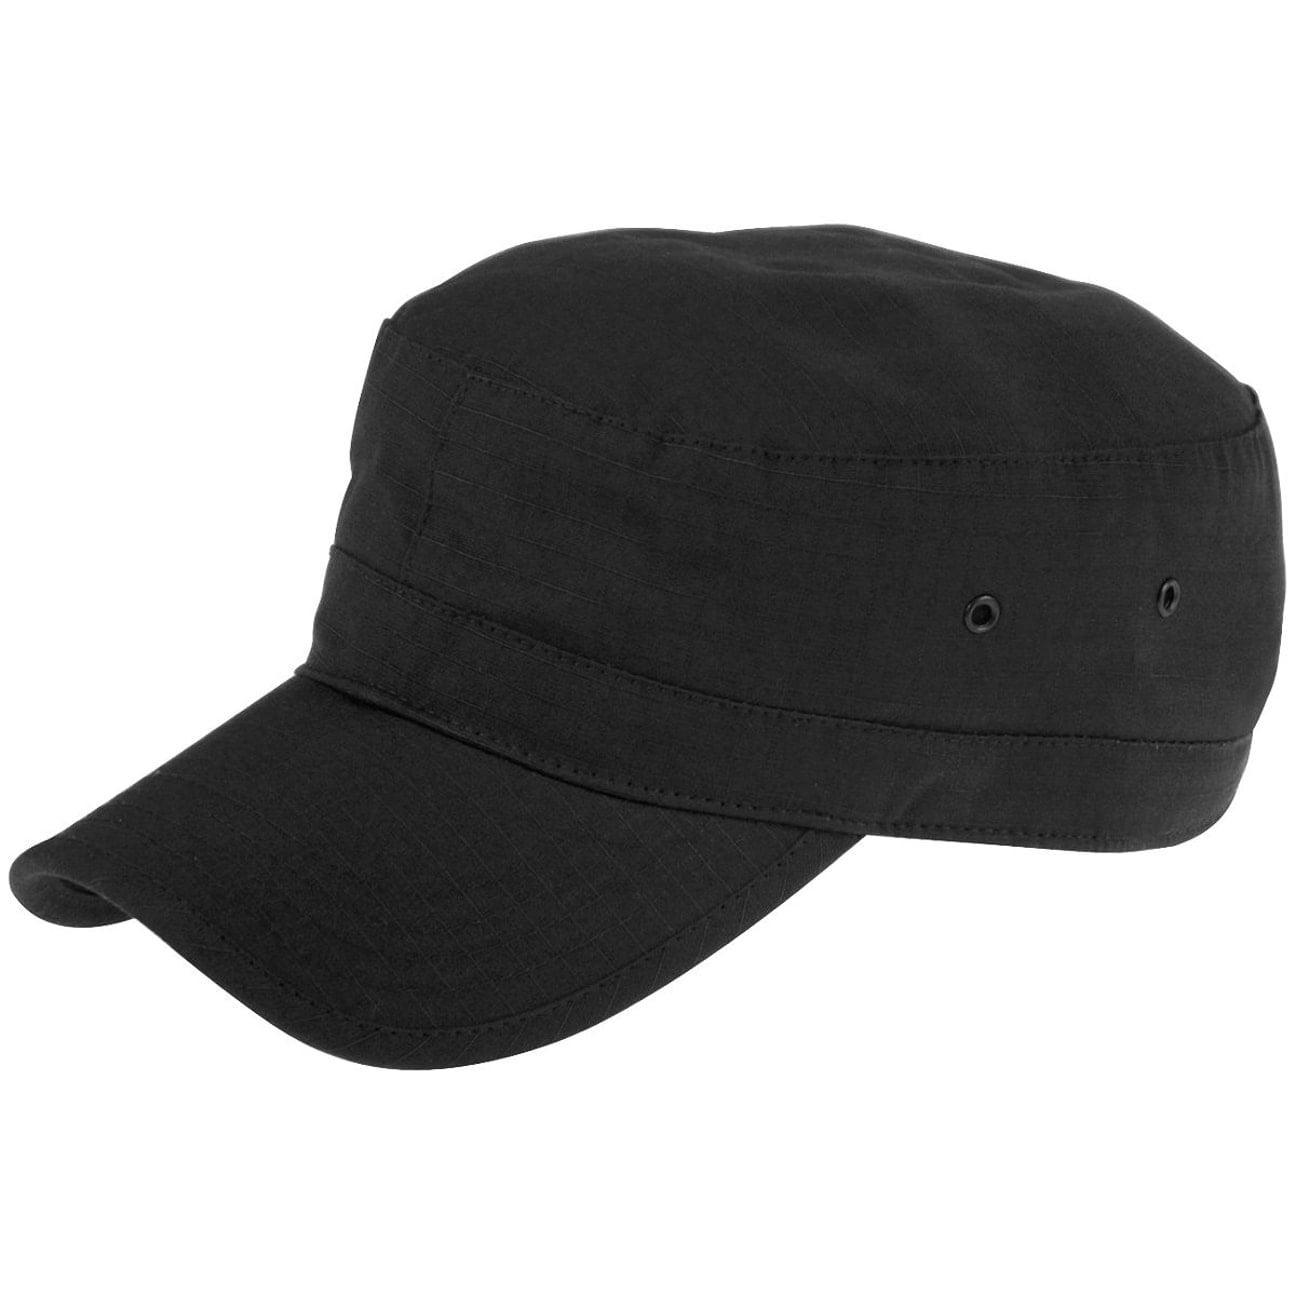 Gorra Militar Winter - Gorras - sombreroshop.es e2af18a3c34